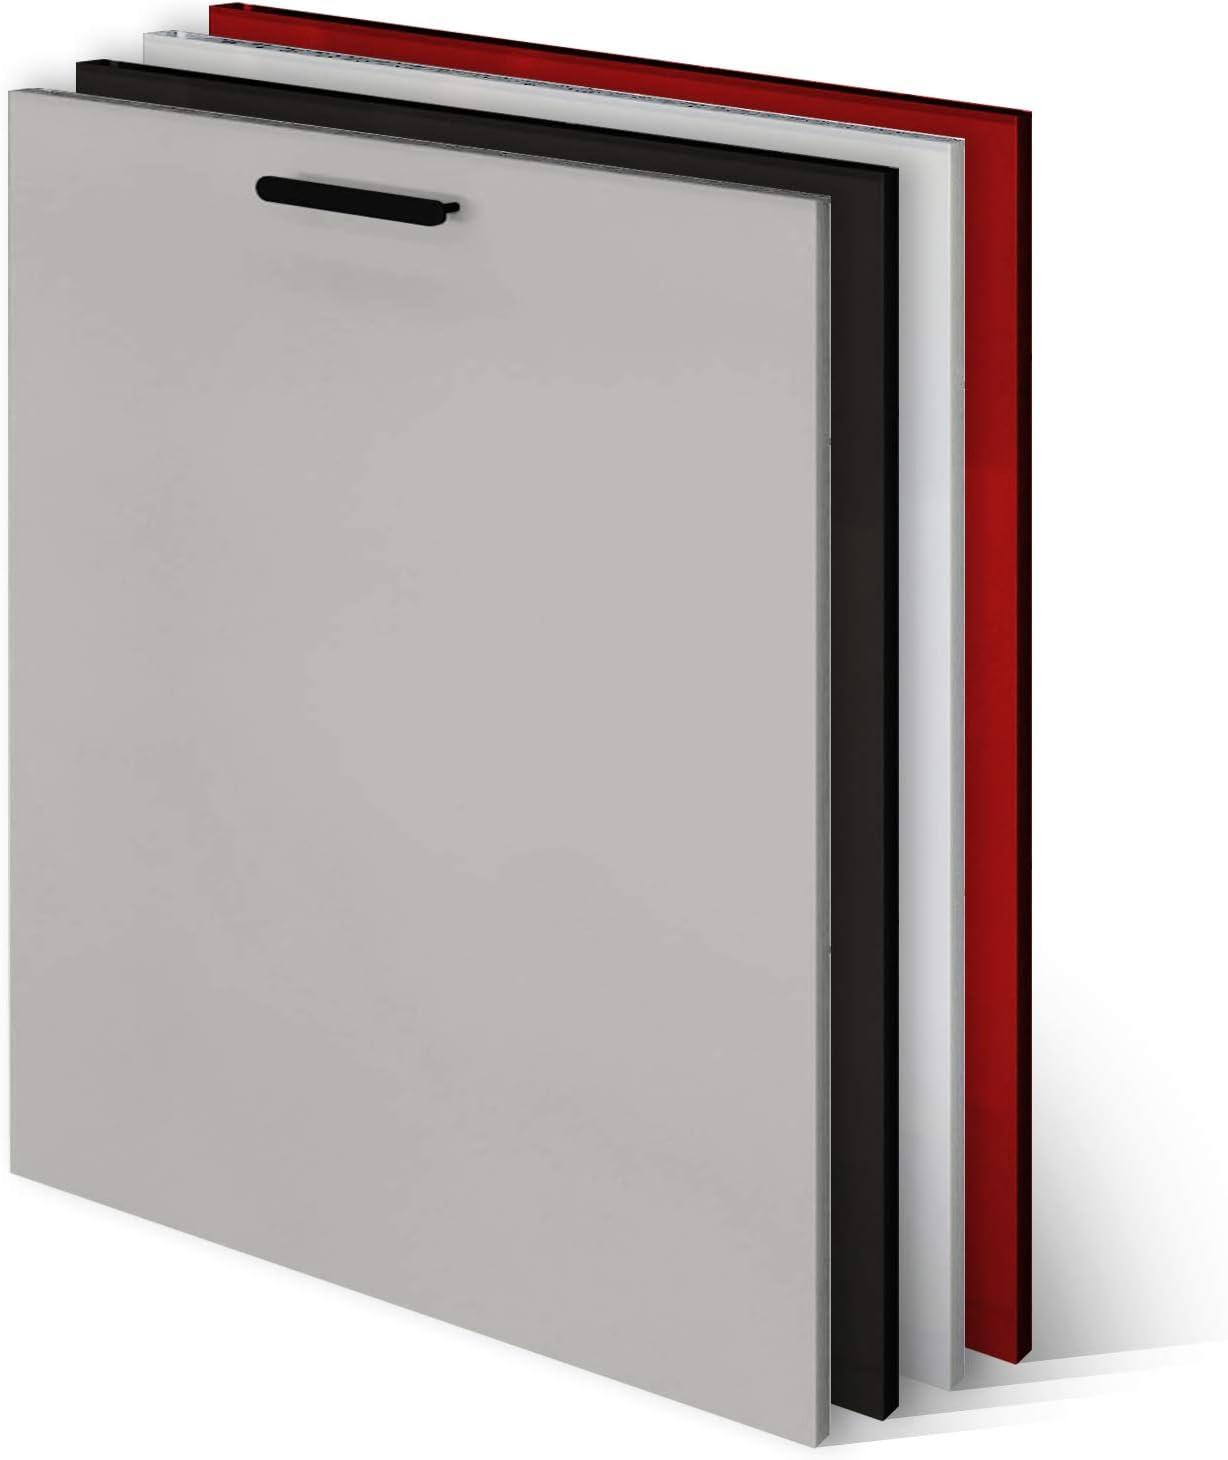 KLEMP Panel frontal para lavavajillas, 594 x 565 mm, Cool Grey Mat